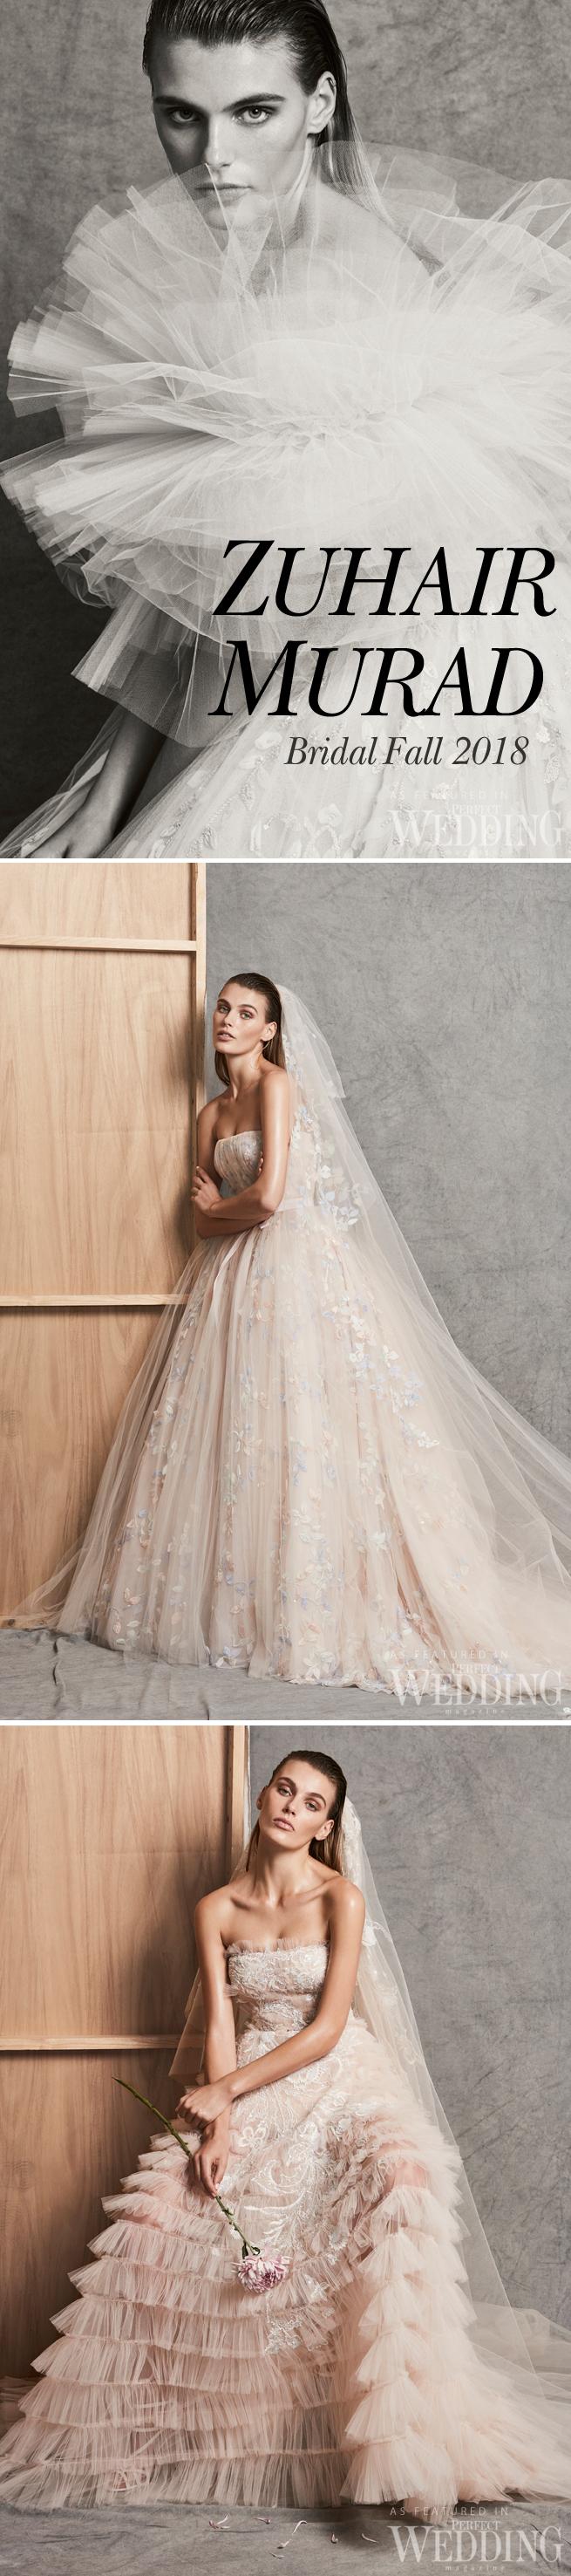 Zuhair Murad, Zuhair Murad Bridal 2018 Fall Collection, Zuhair Murad Bridal Gowns, Zuhair Murad Bride, Fall 2018 bridal trends, Perfect Wedding Magazine, Perfect Wedding Blog, Bridal Trends, Pink Wedding Gowns, Blush Wedding Gowns